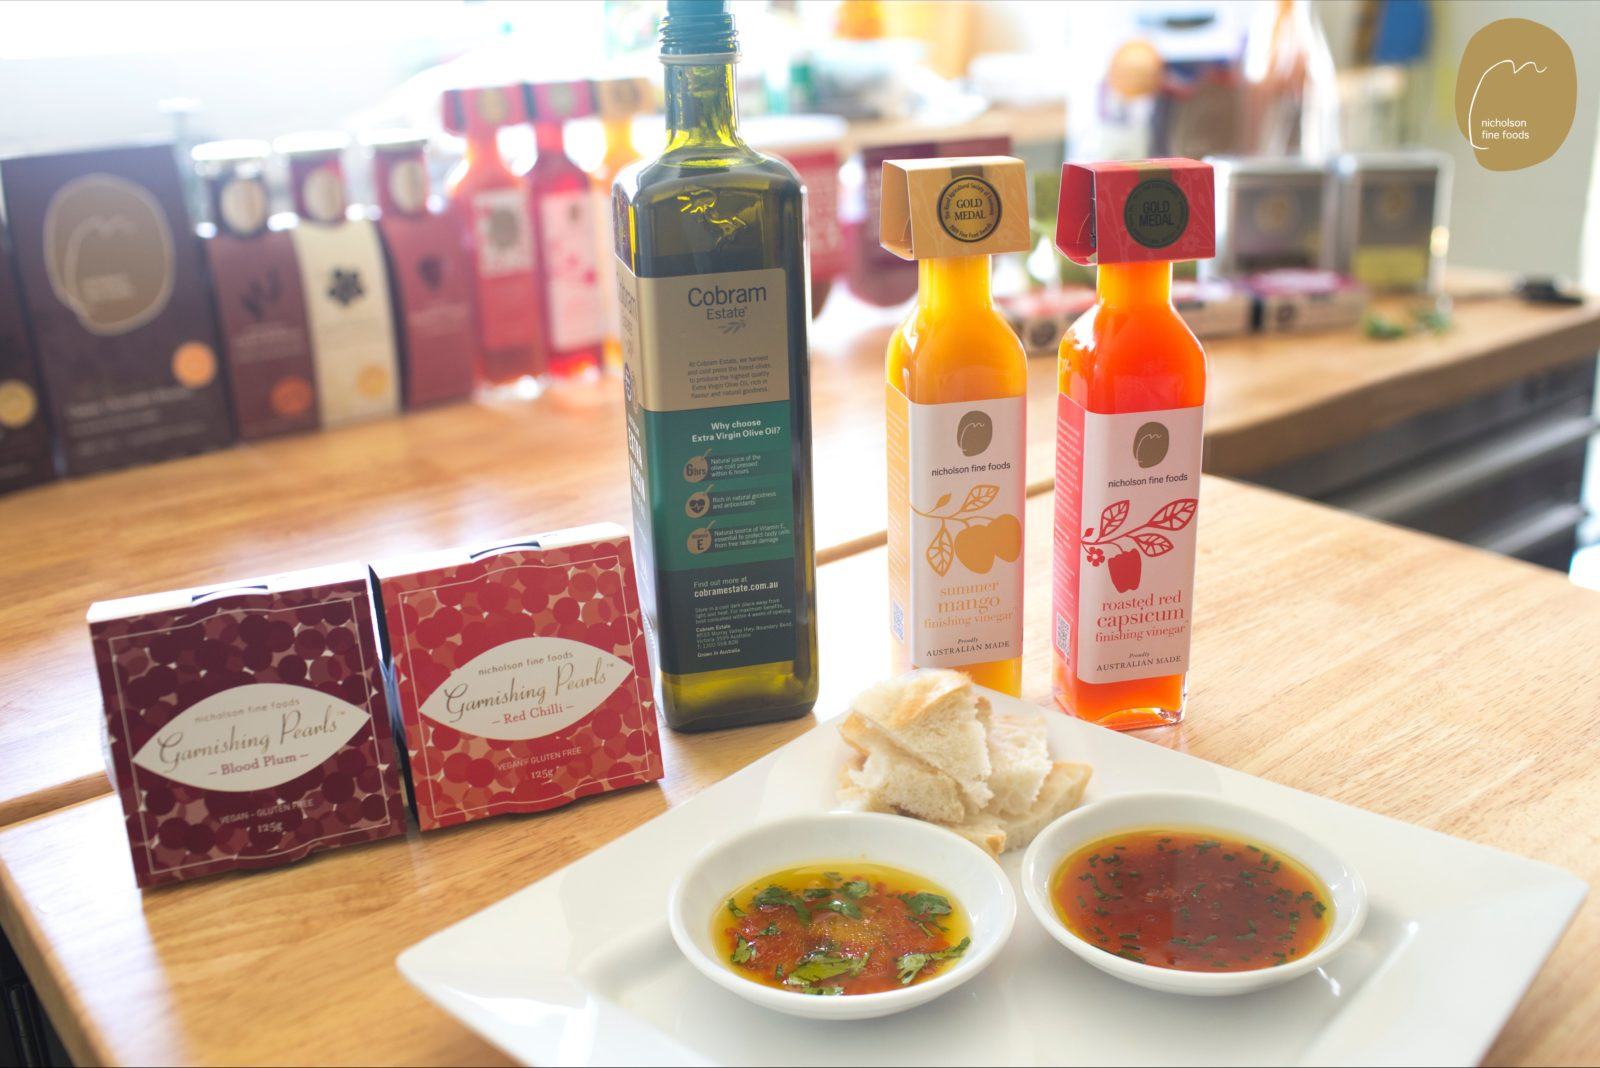 Garnishing Pearls and Finishing Vinegar by Nicholson Fine Foods